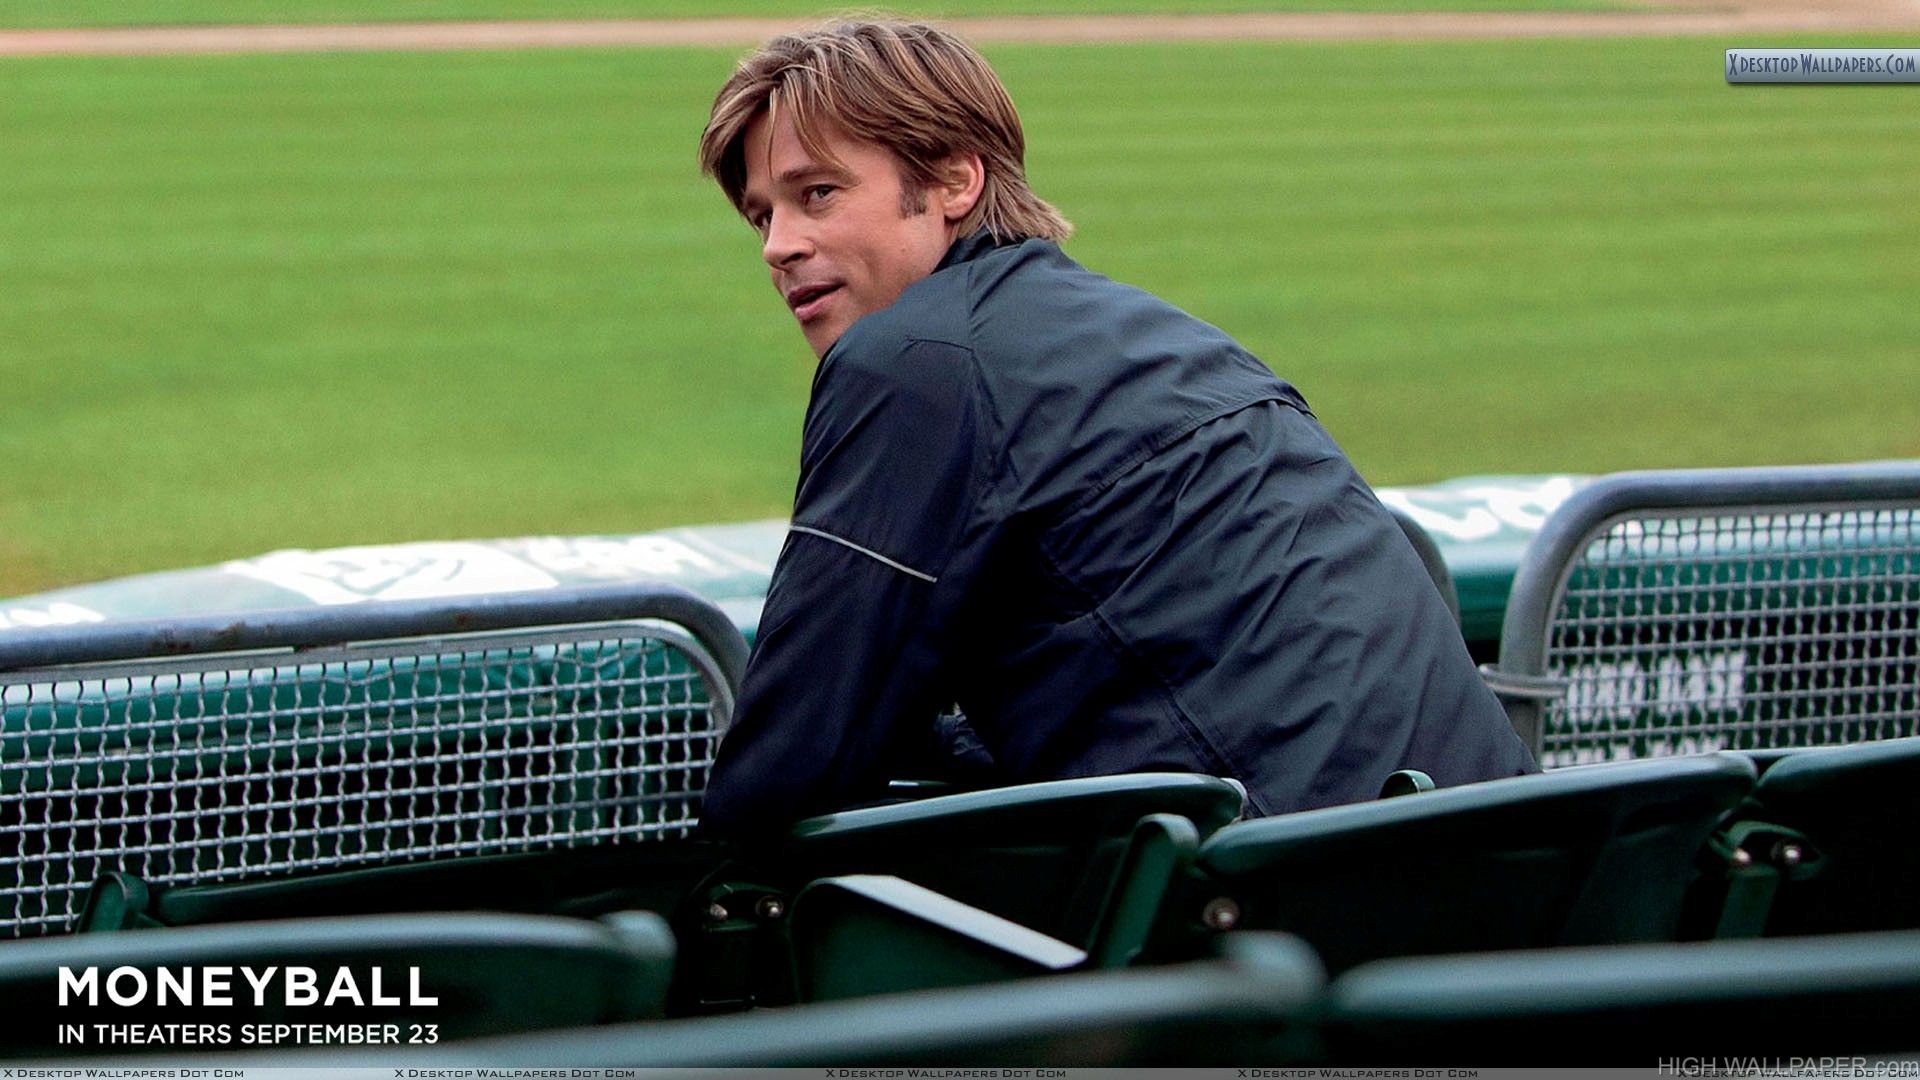 Moneyball Brad Pitt Sitting And Looking Back